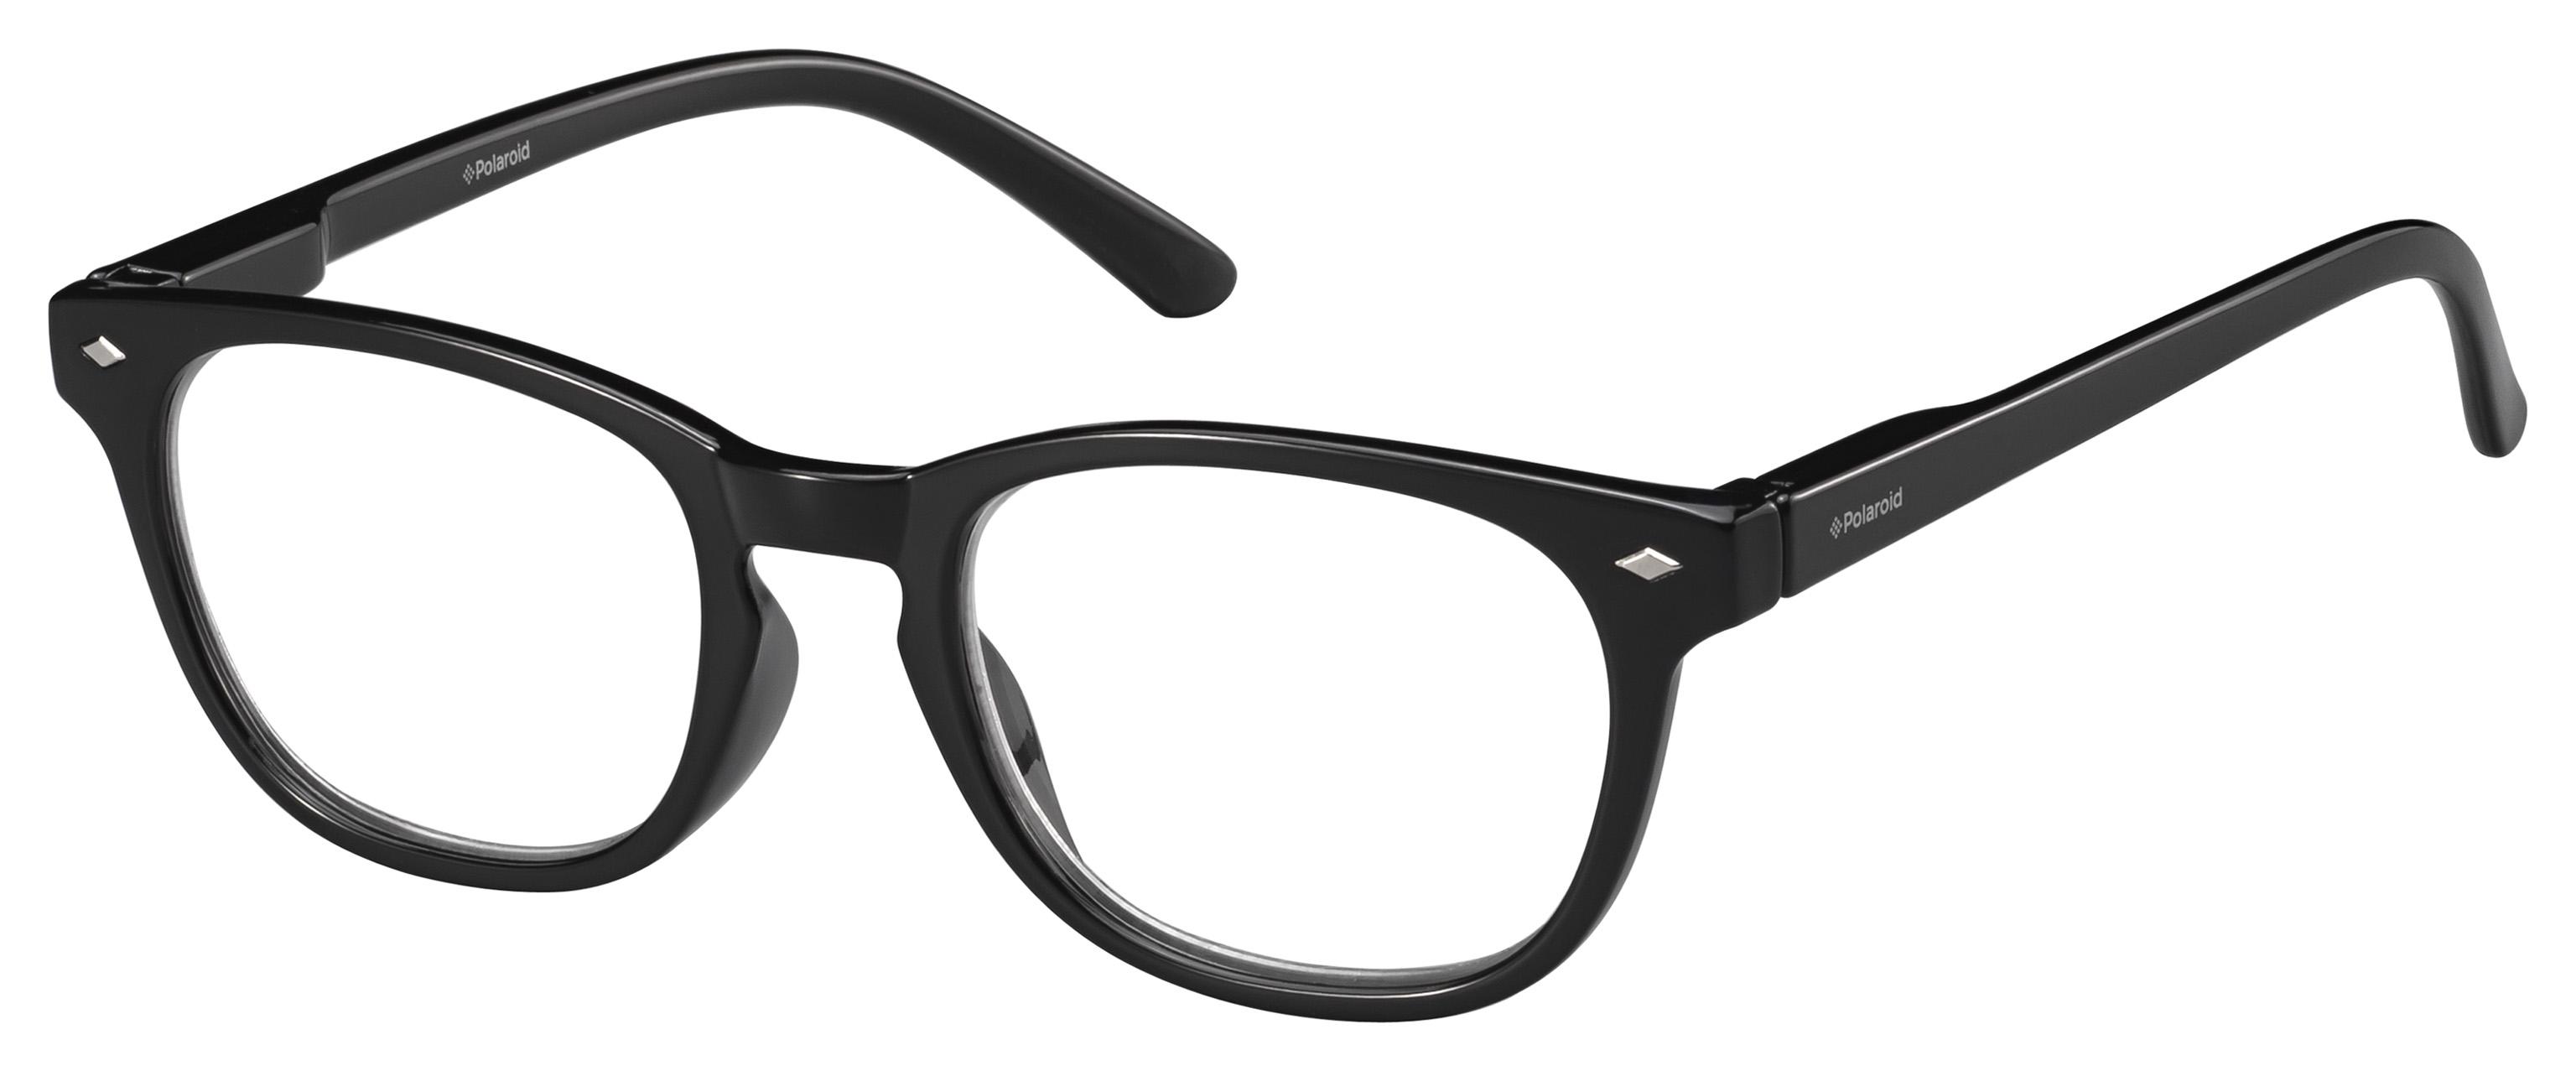 Leesbril Polaroid PLD0012 zwart